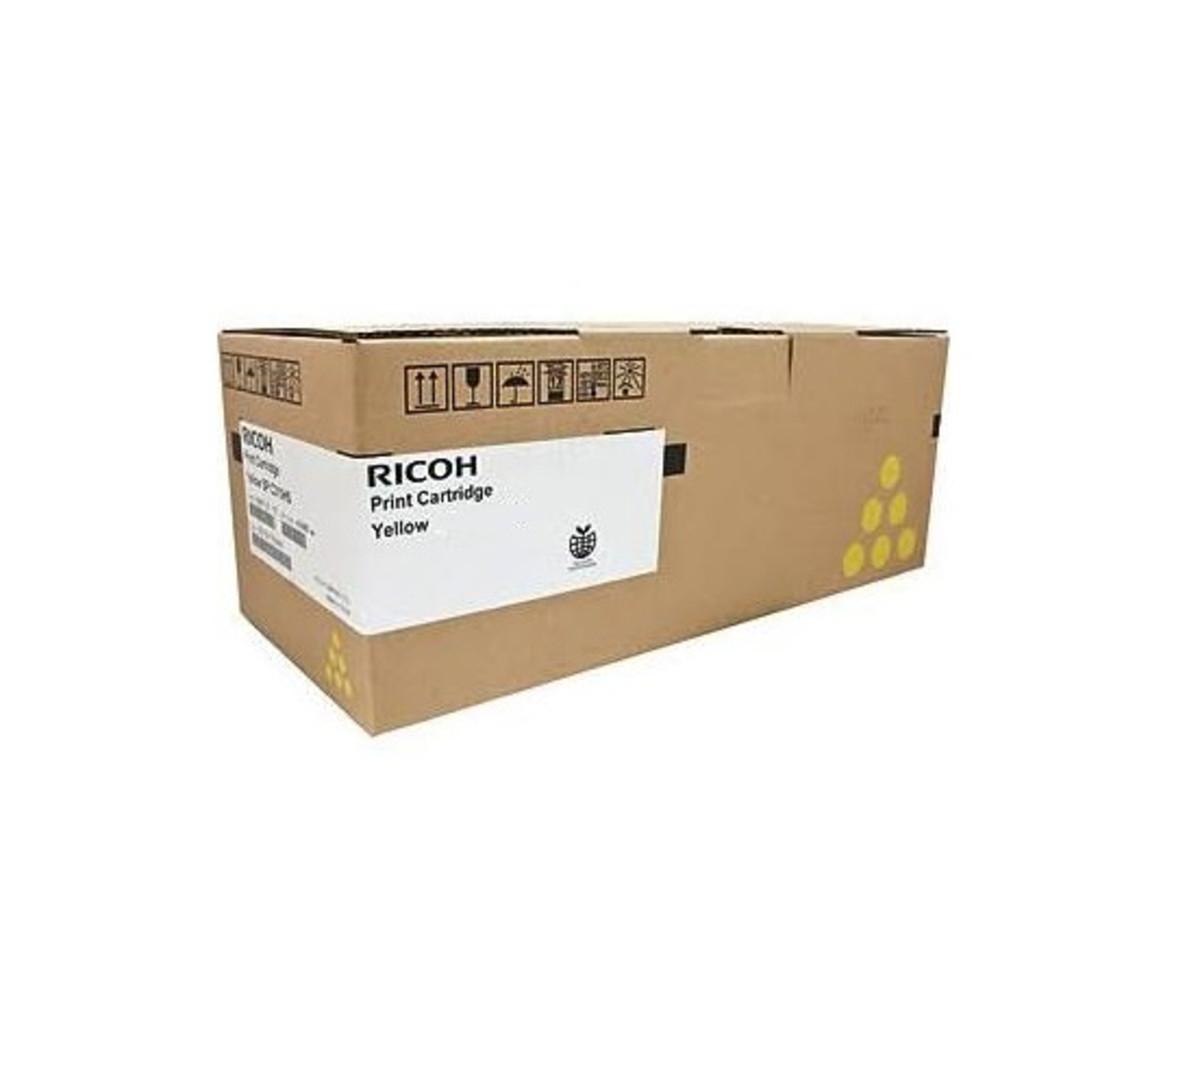 Ricoh 841704 Yellow Toner Cartridge